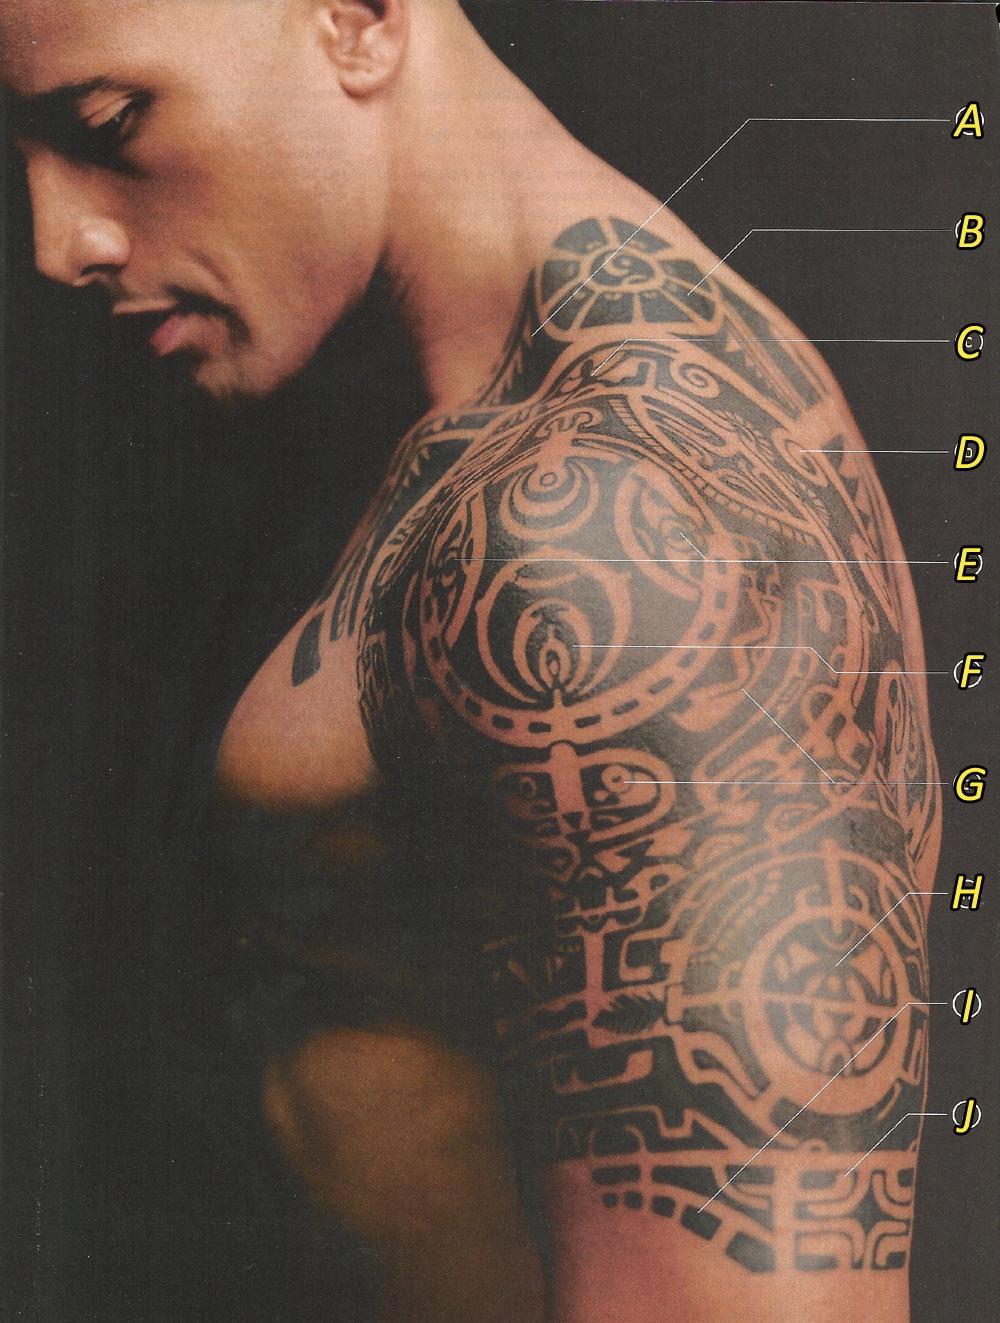 dwayne johnson tattoos celebrities tattooed. Black Bedroom Furniture Sets. Home Design Ideas